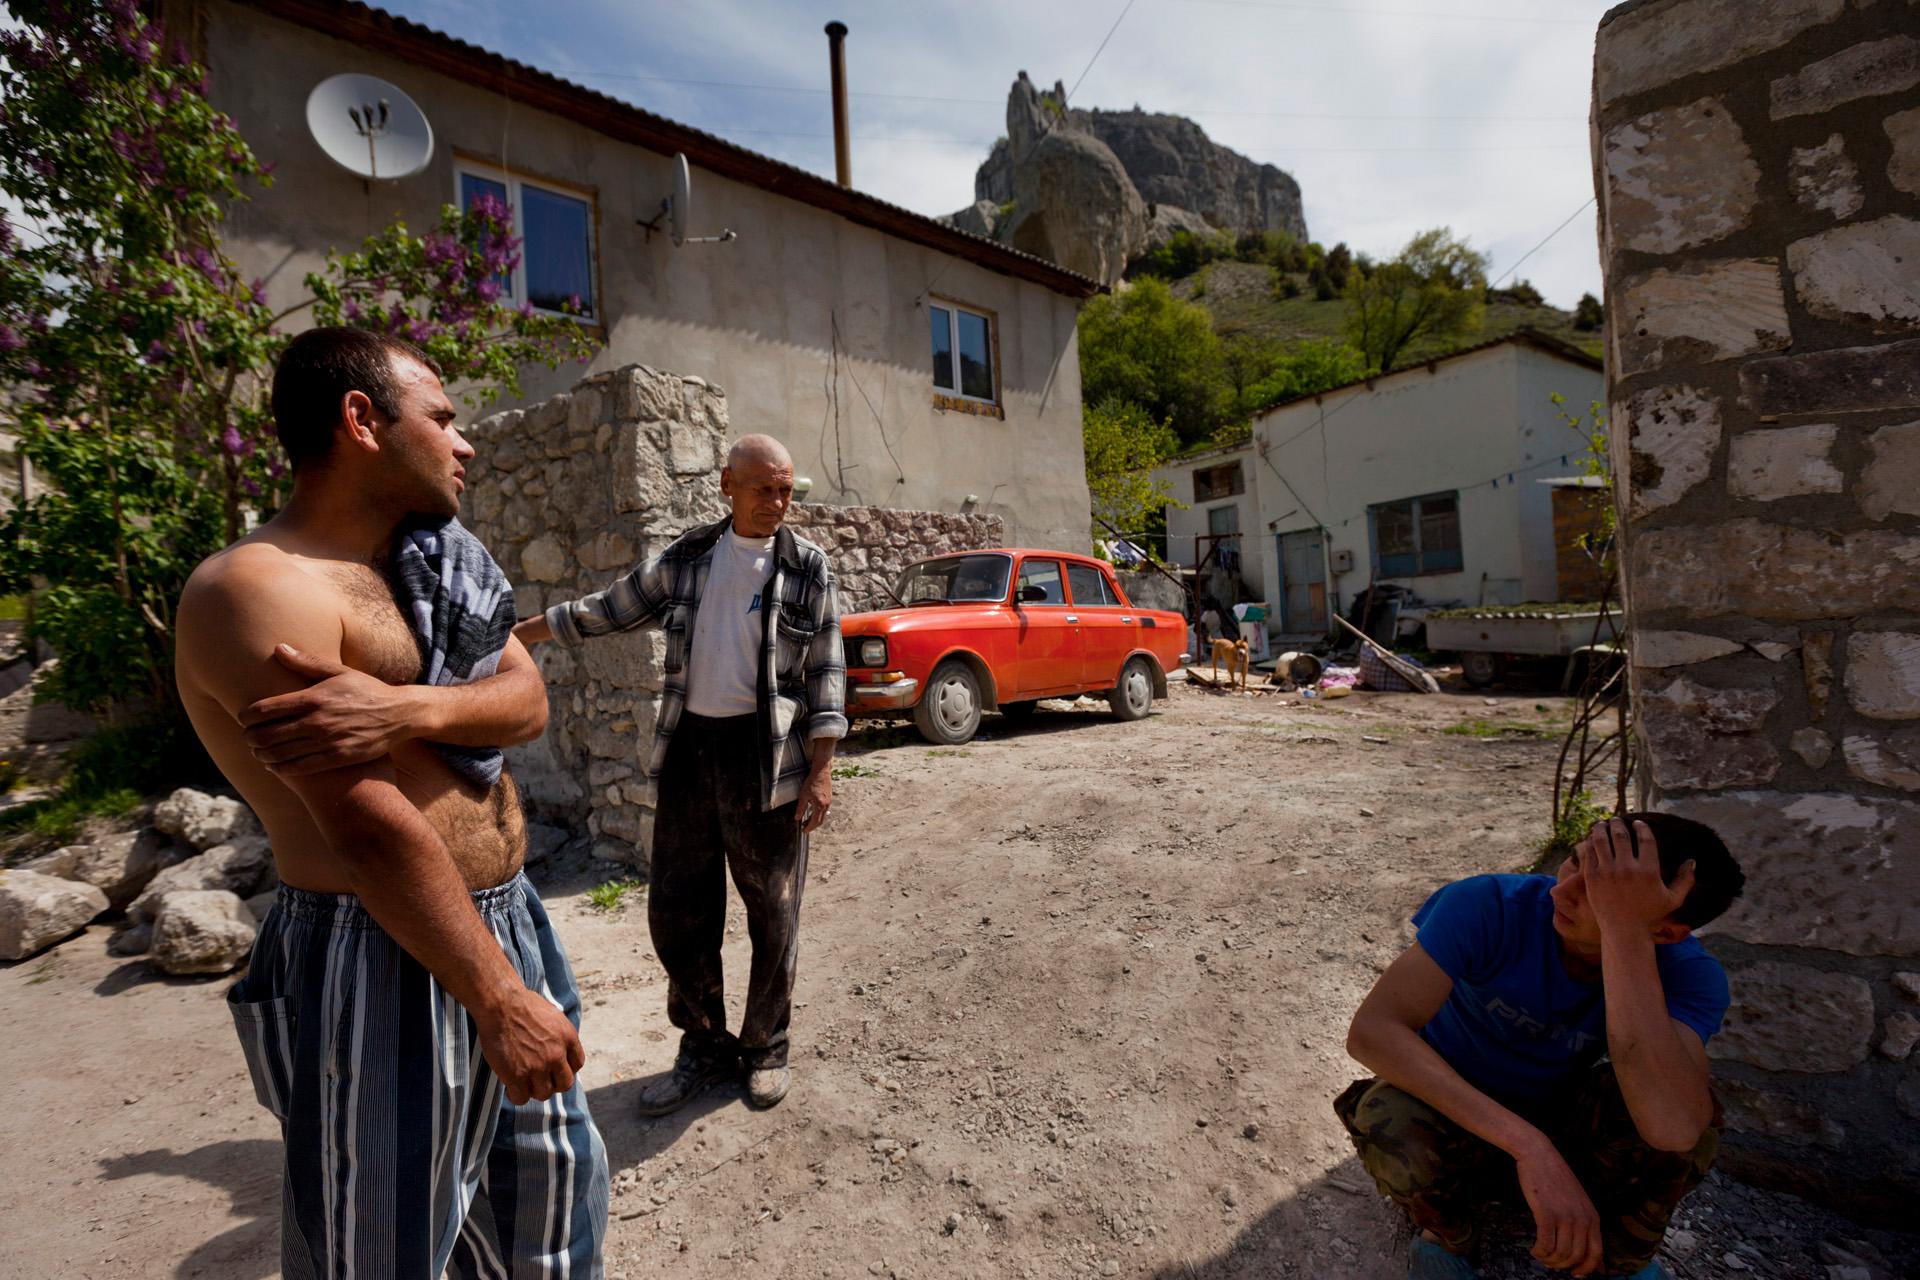 In the streets of the Tatar village Staroselye, near Bakhchiseray.  Staroselye, Crimea